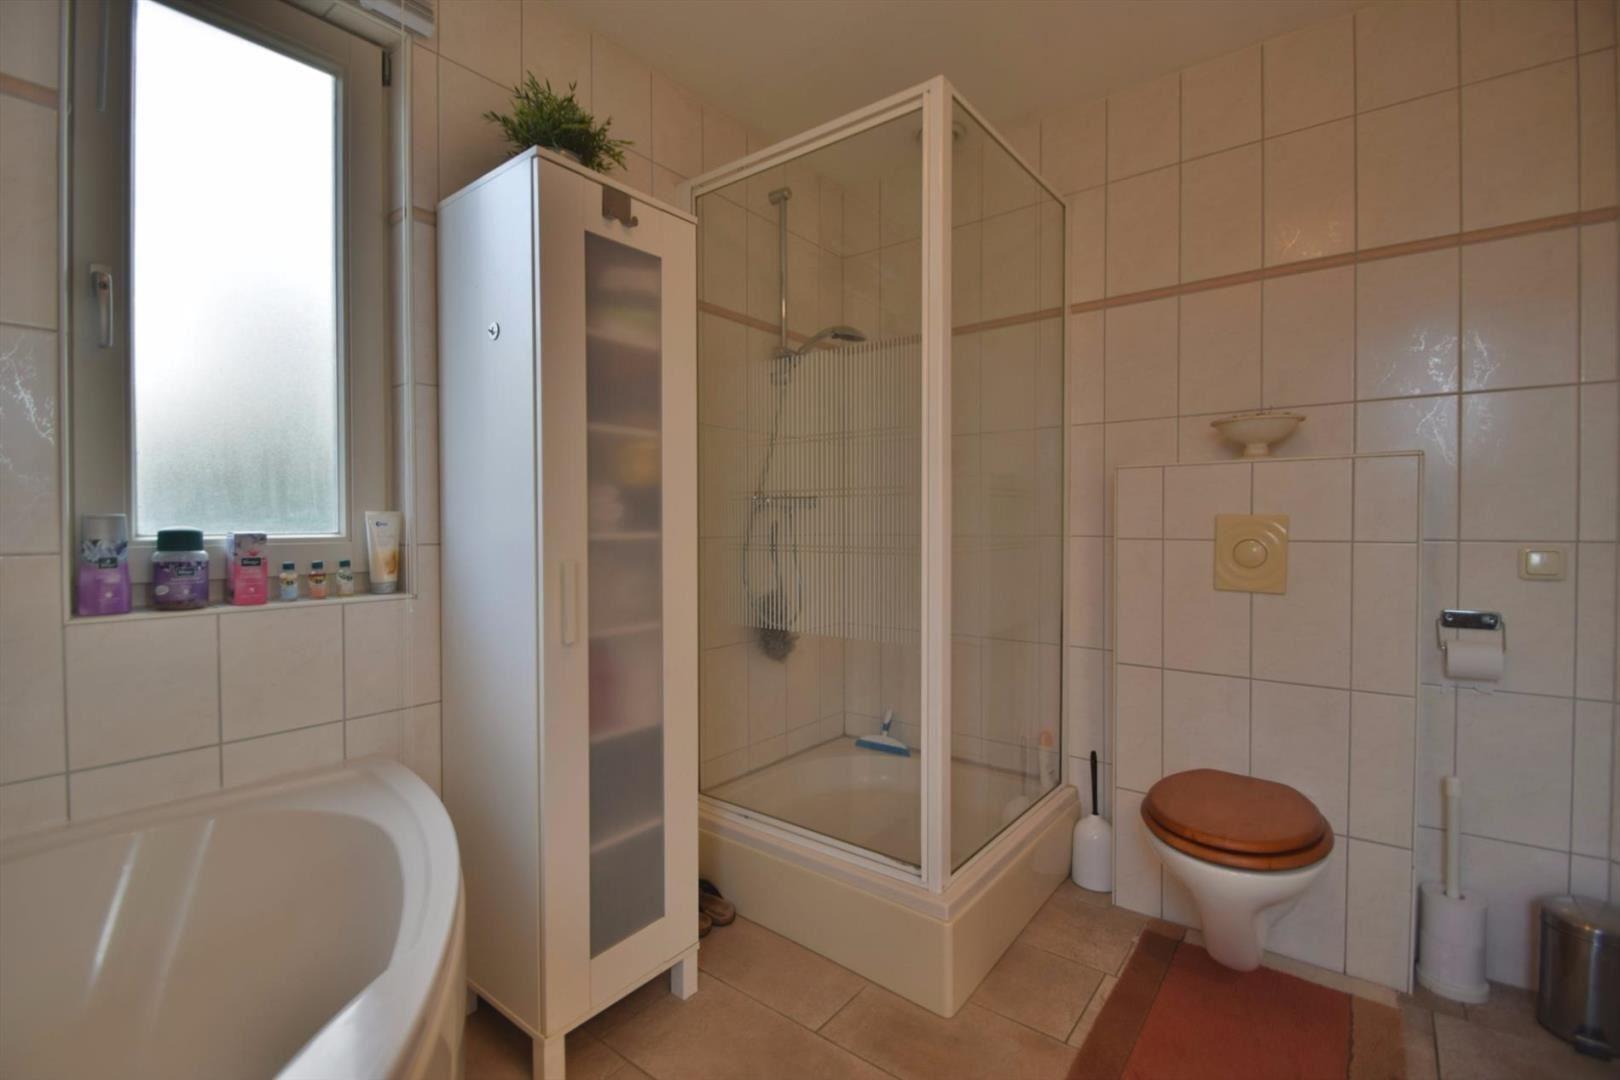 zundert badkamers] - 15 images - agape ottocento wastafel met ...